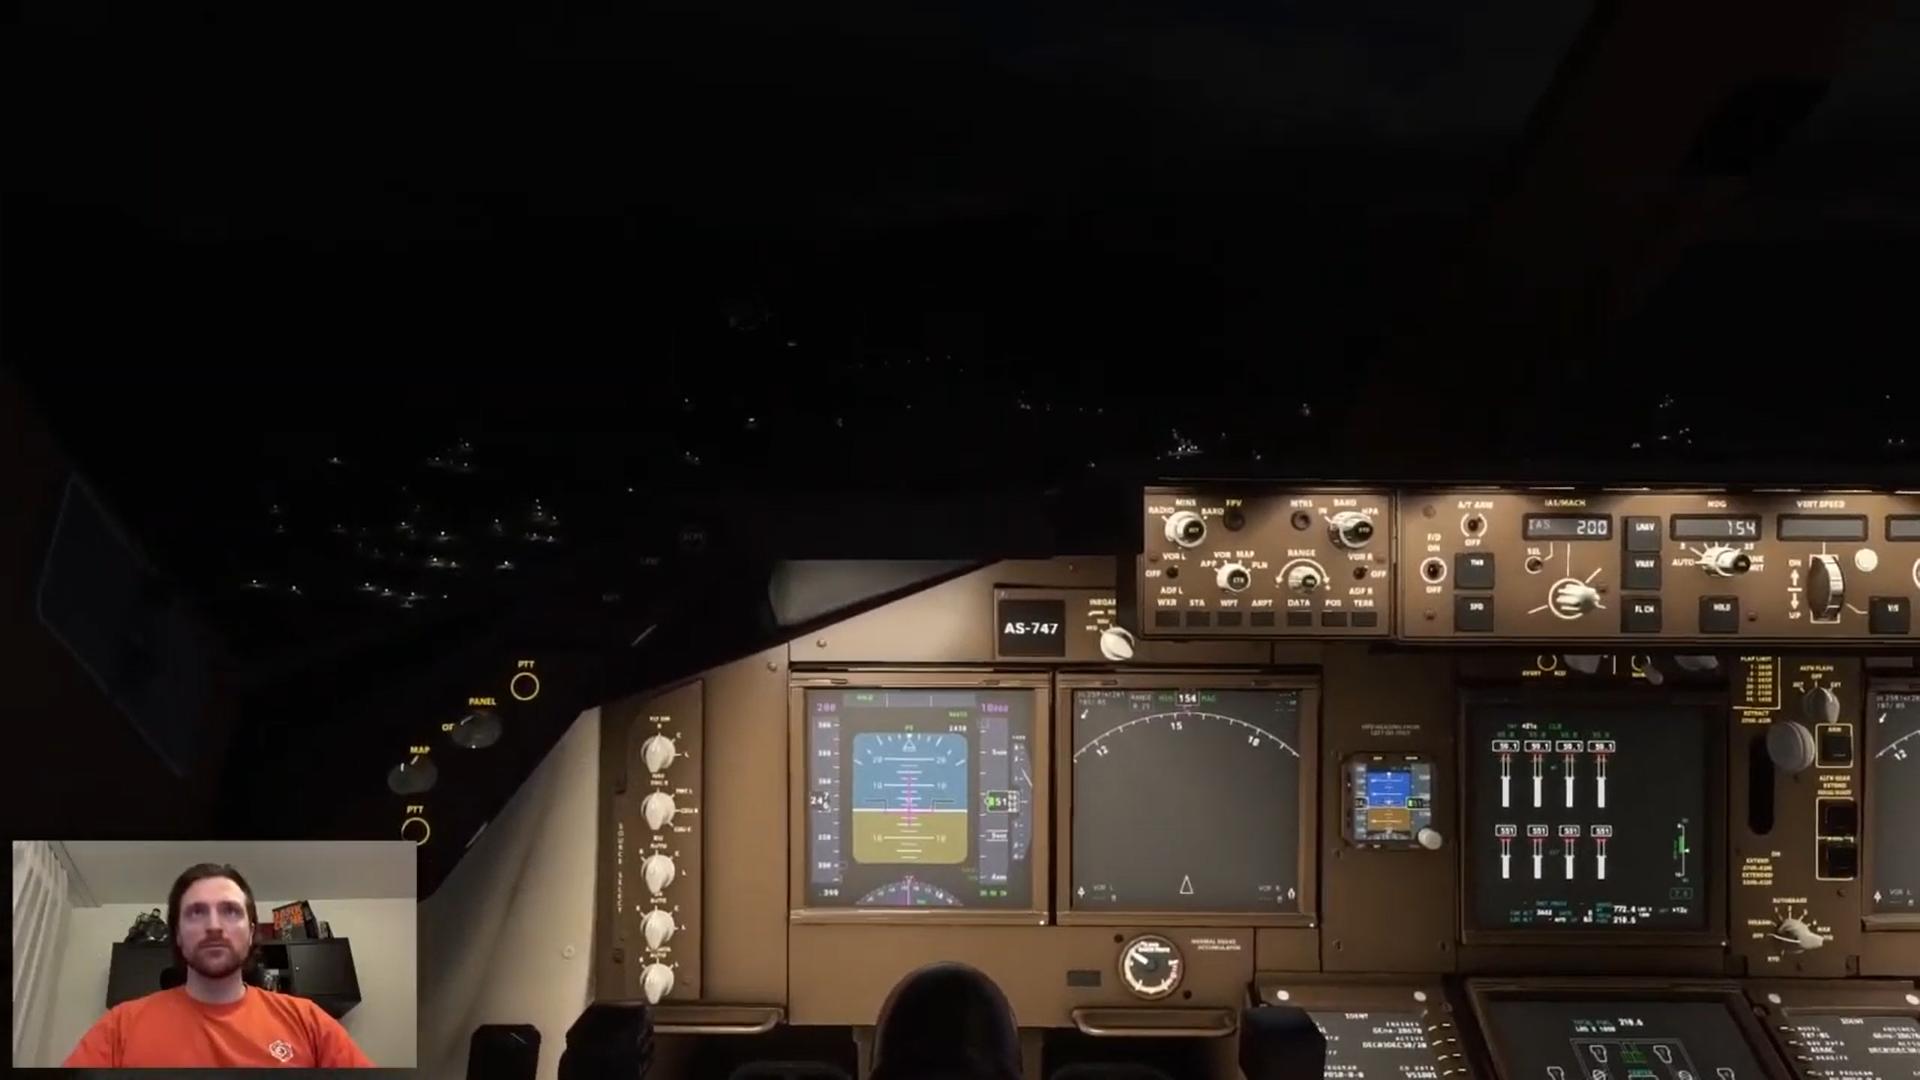 microsoft flight simulator with head tracking eyeware beam